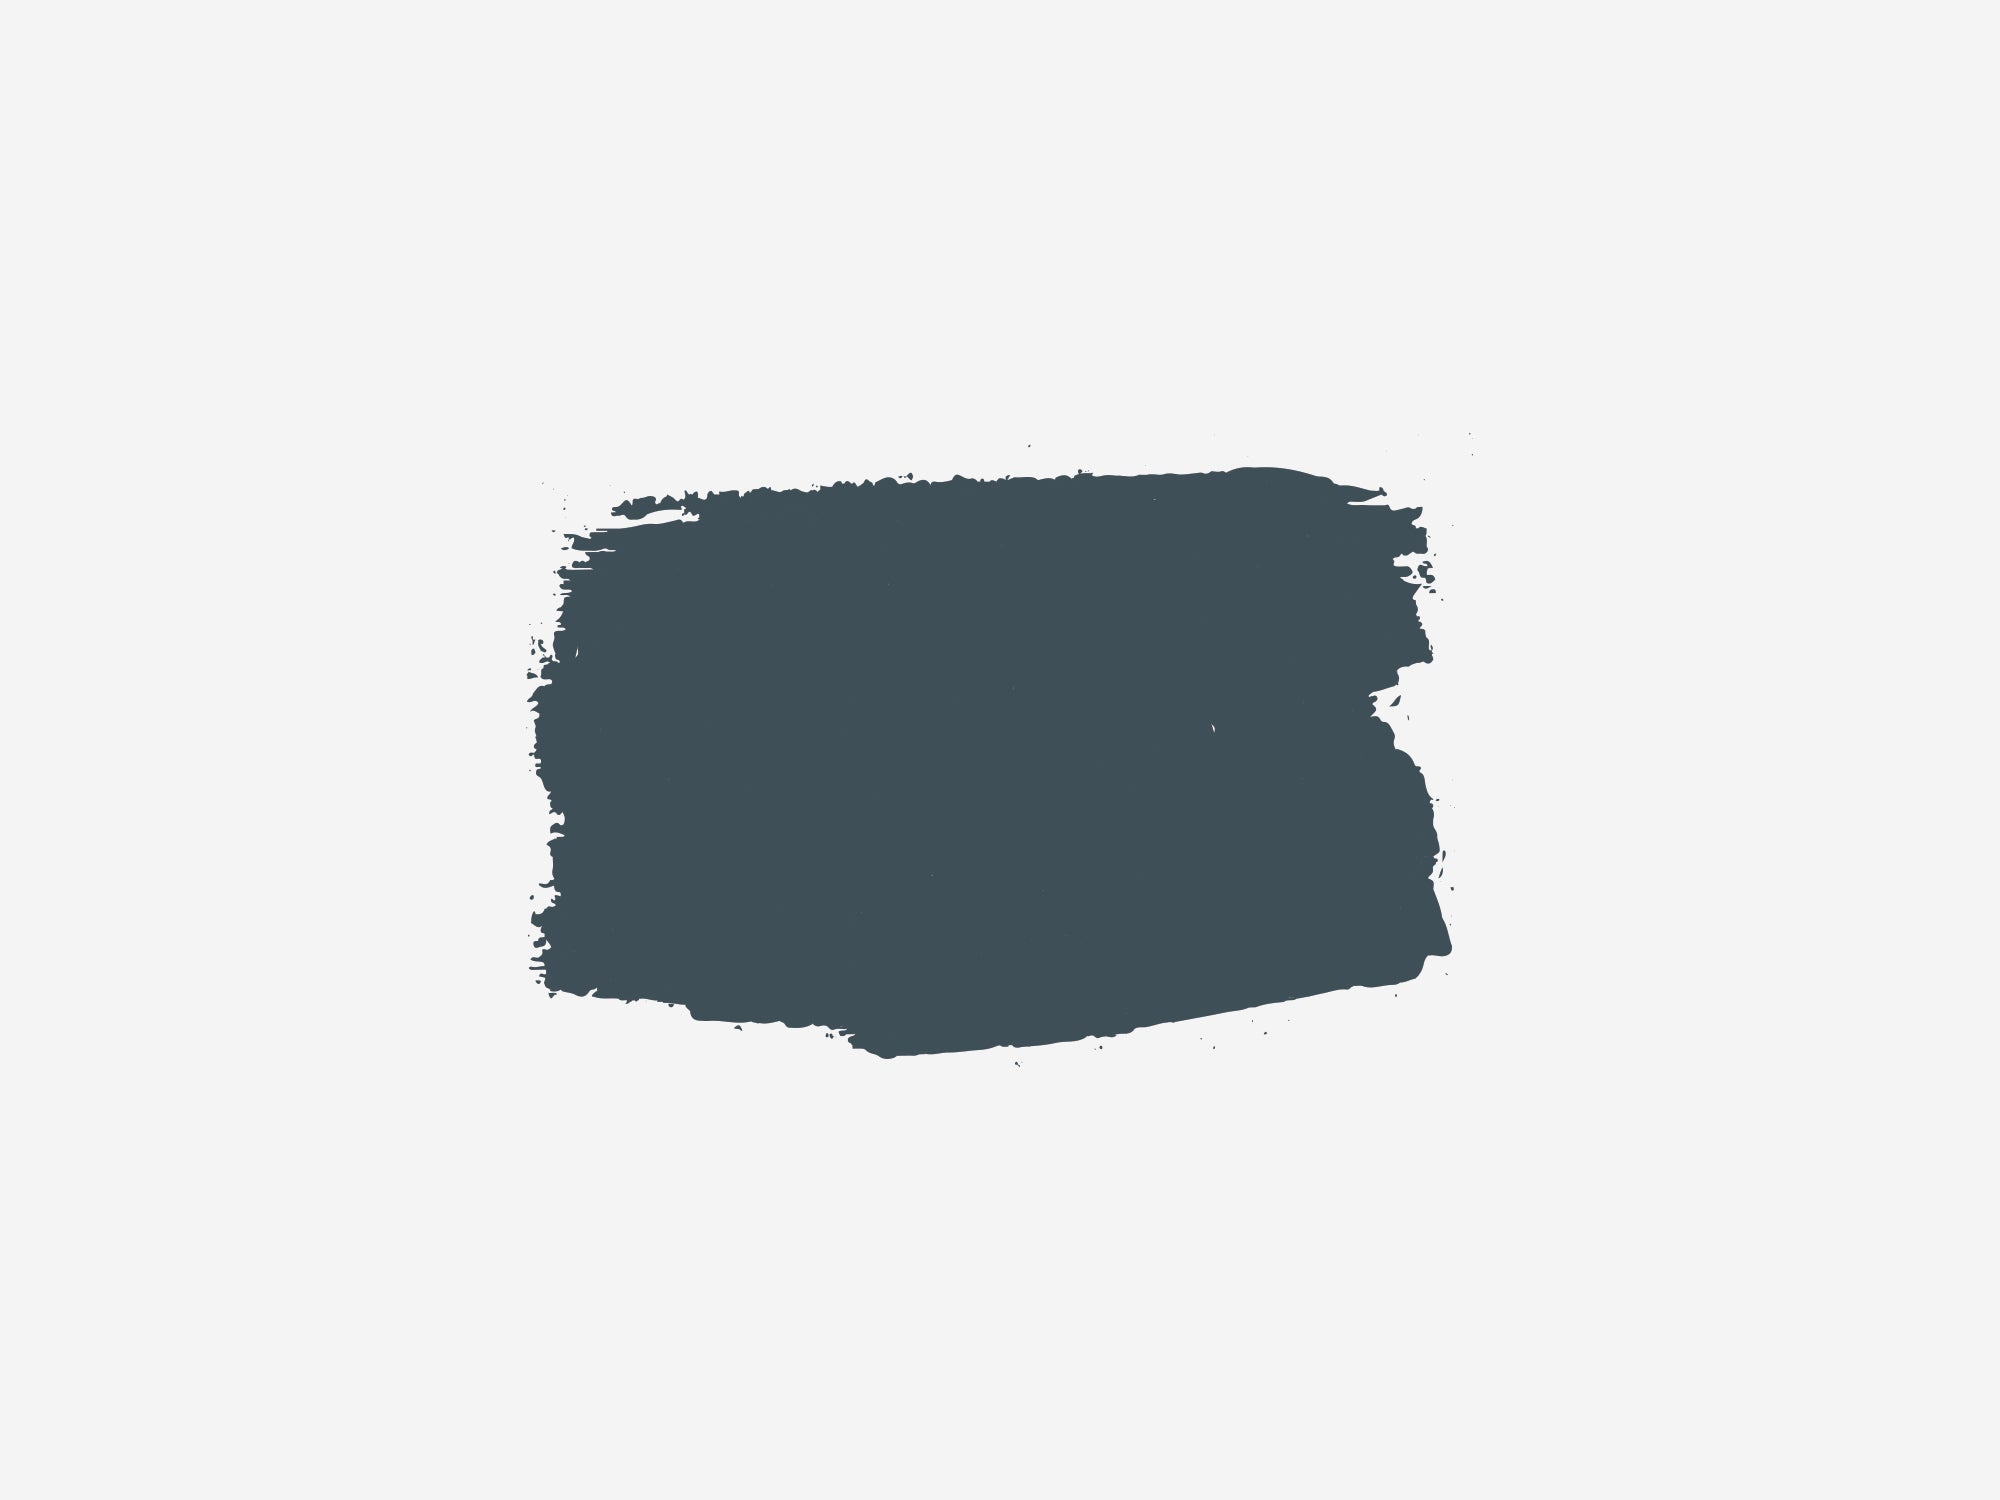 portola_paints_lost_highway